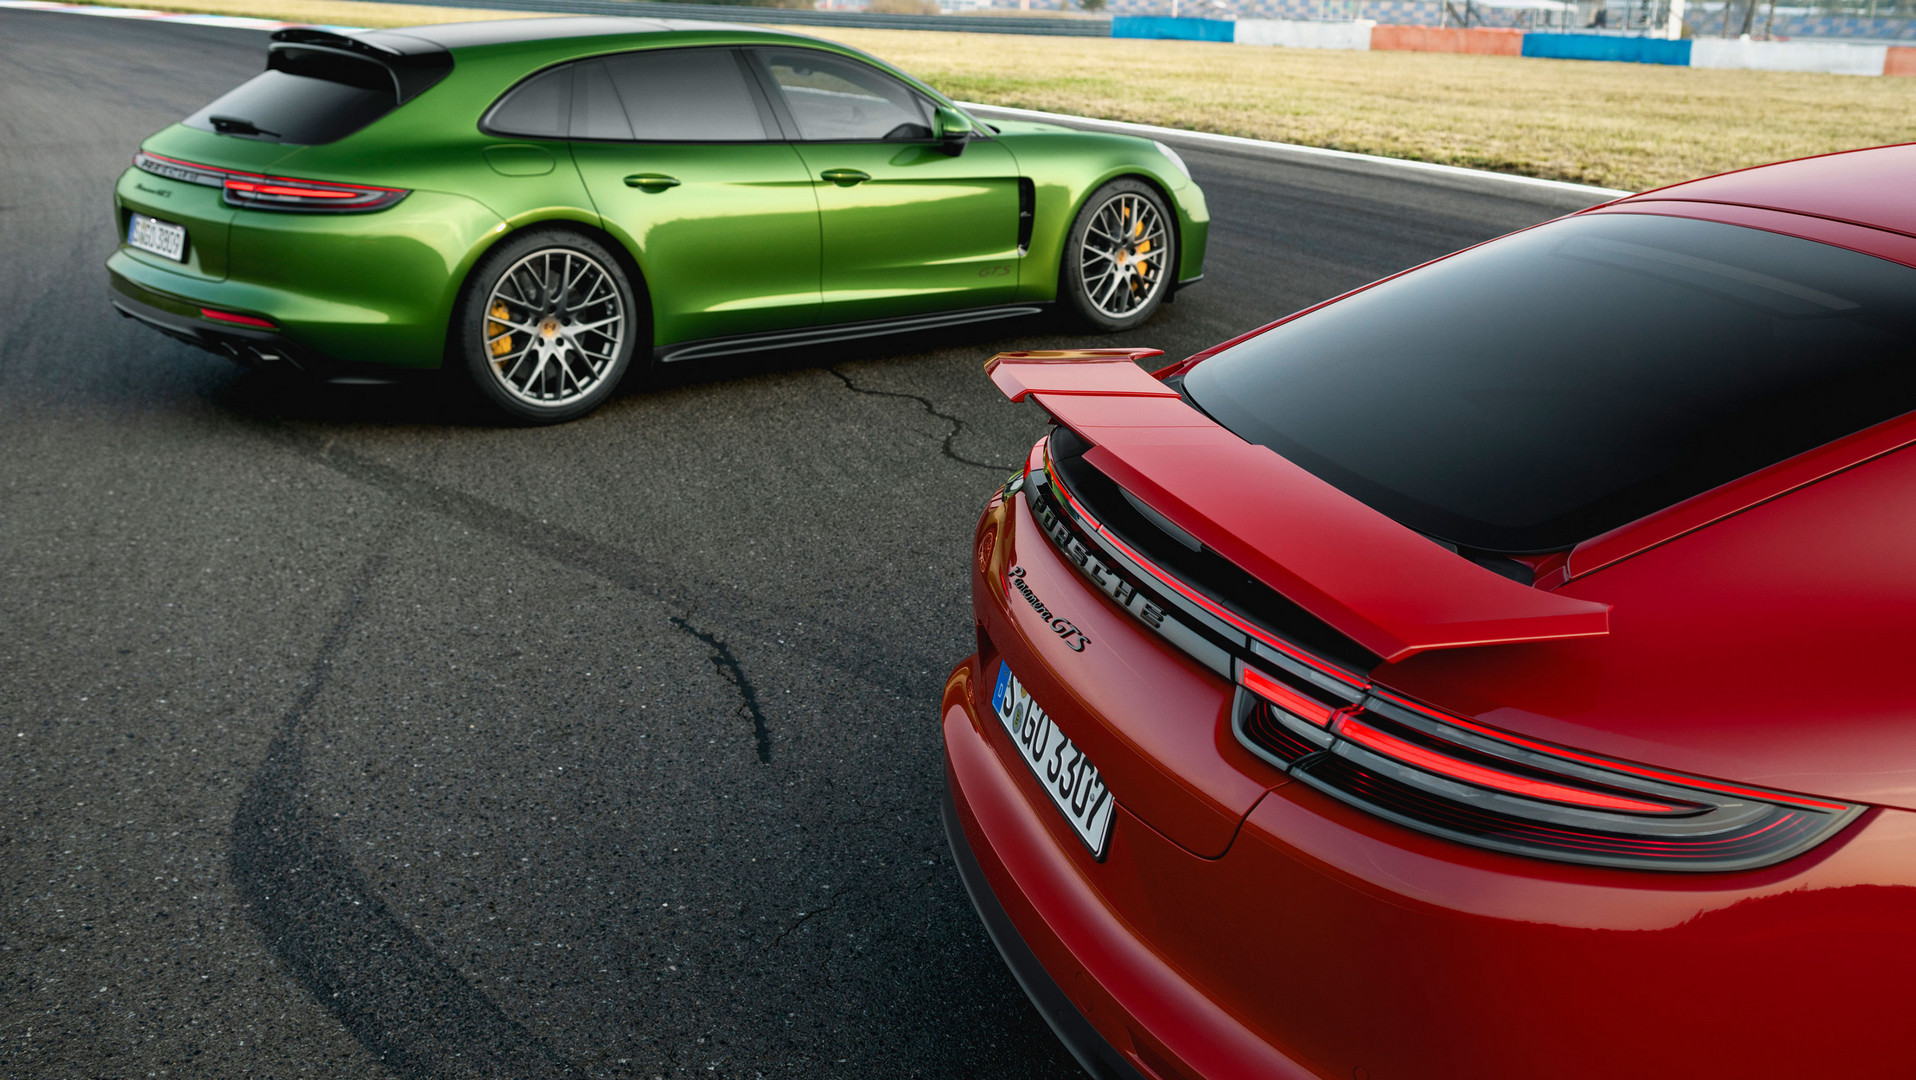 2019 Porsche Panamera GTS Models Revealed